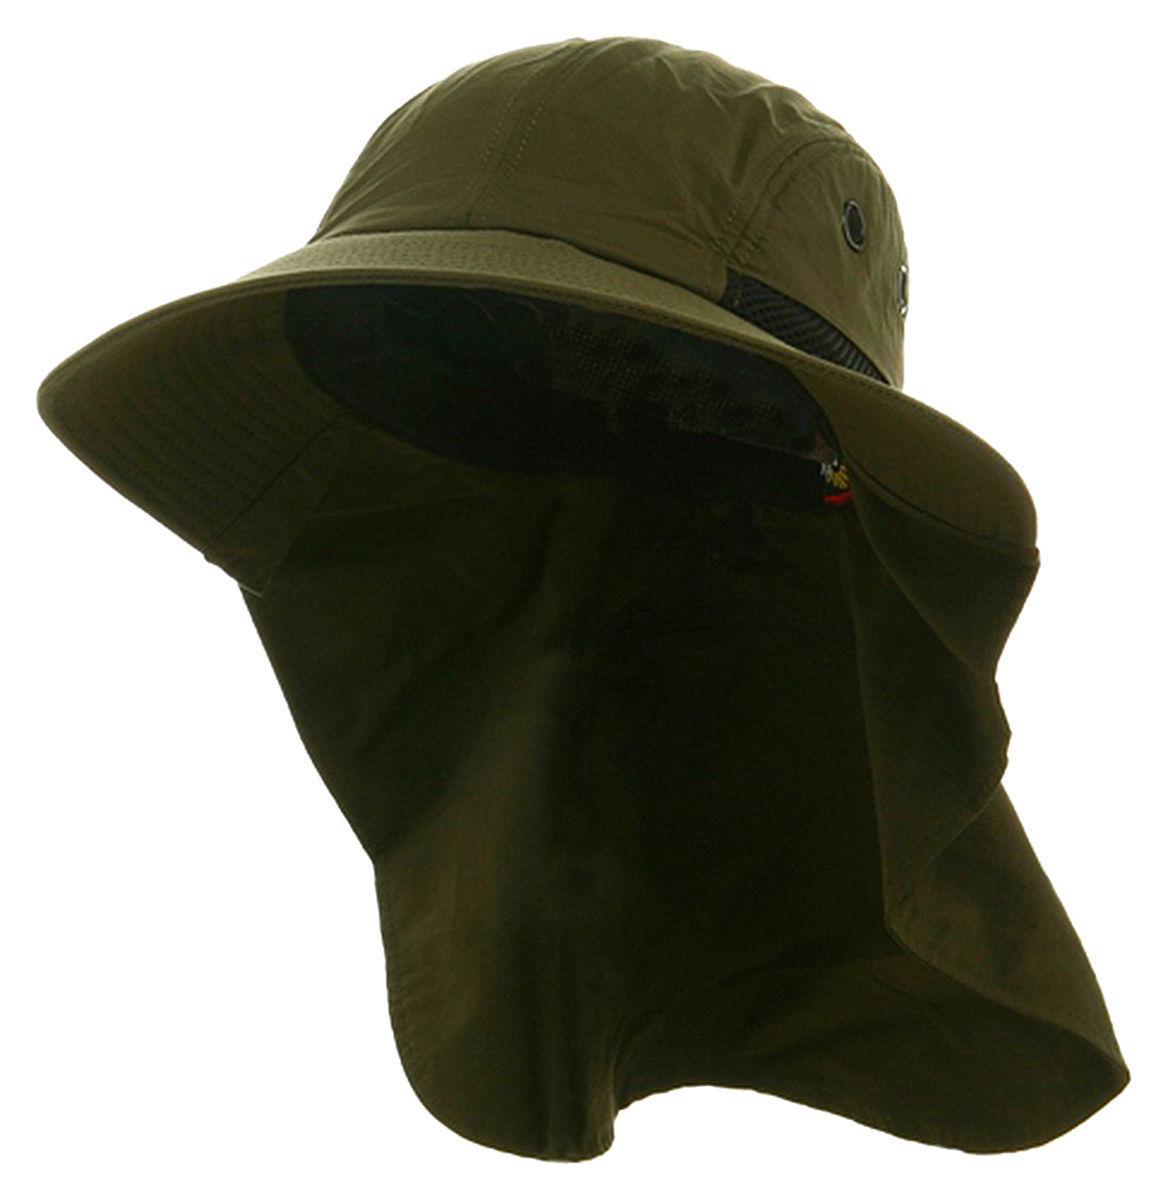 fb49b3cb6ac Adam s Headwear Extreme Outdoor Fishing Travel Sun Wide Bucket Hat Cap UPF  45+